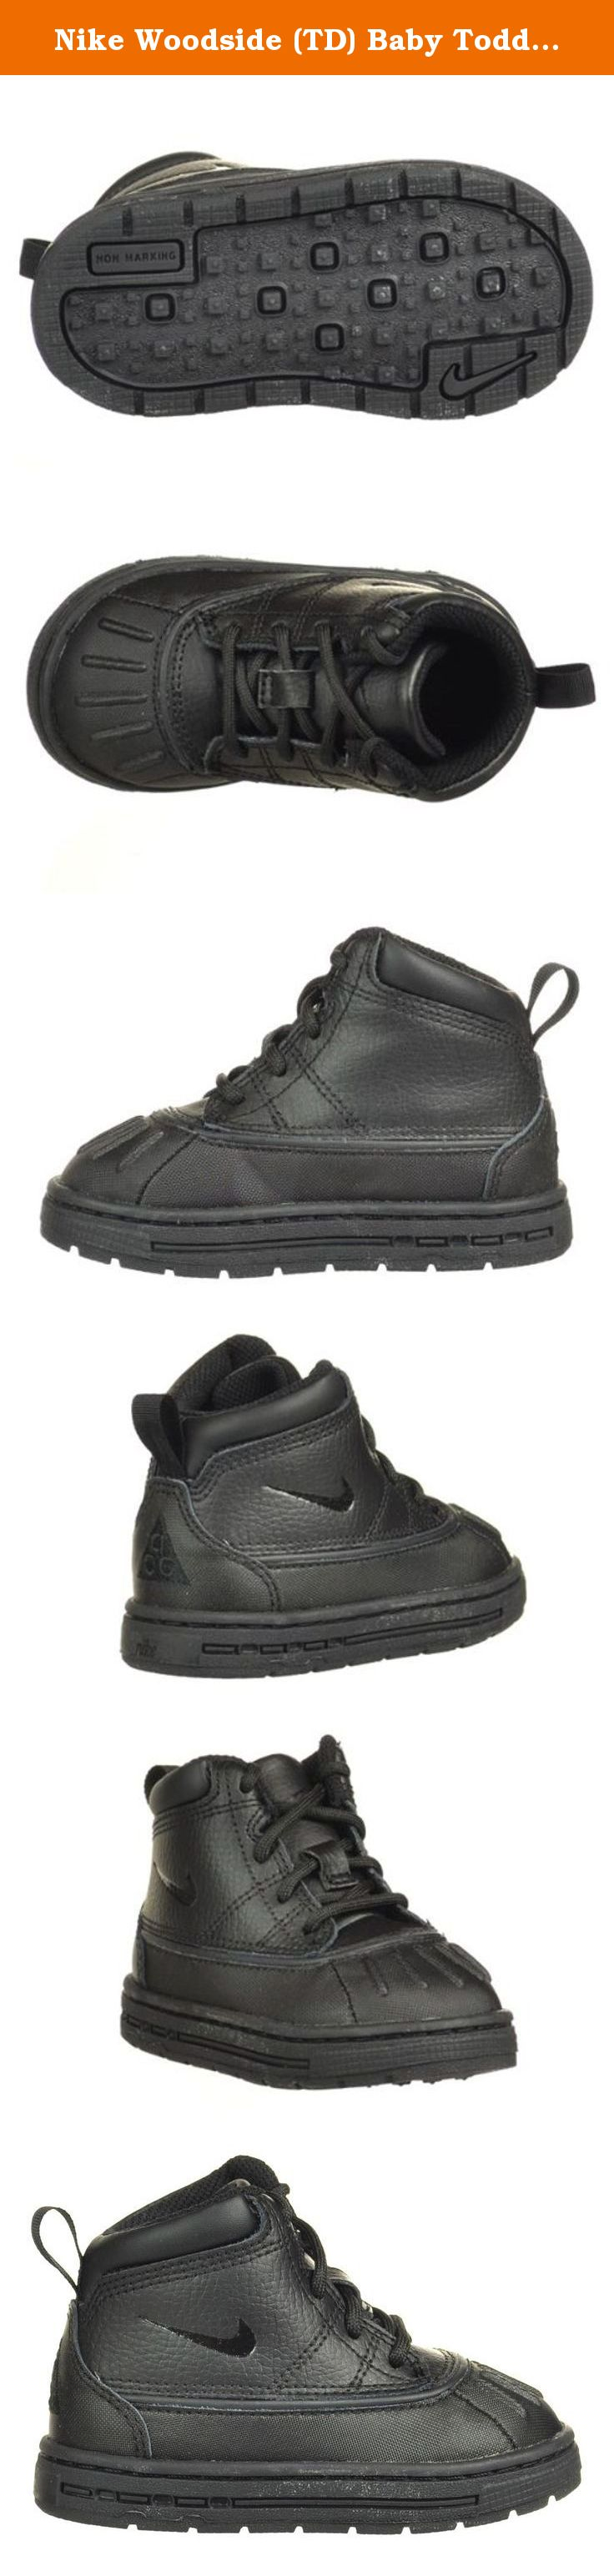 Nike Woodside (TD) Baby Toddlers Boots Black Black 415080-001-7.5.